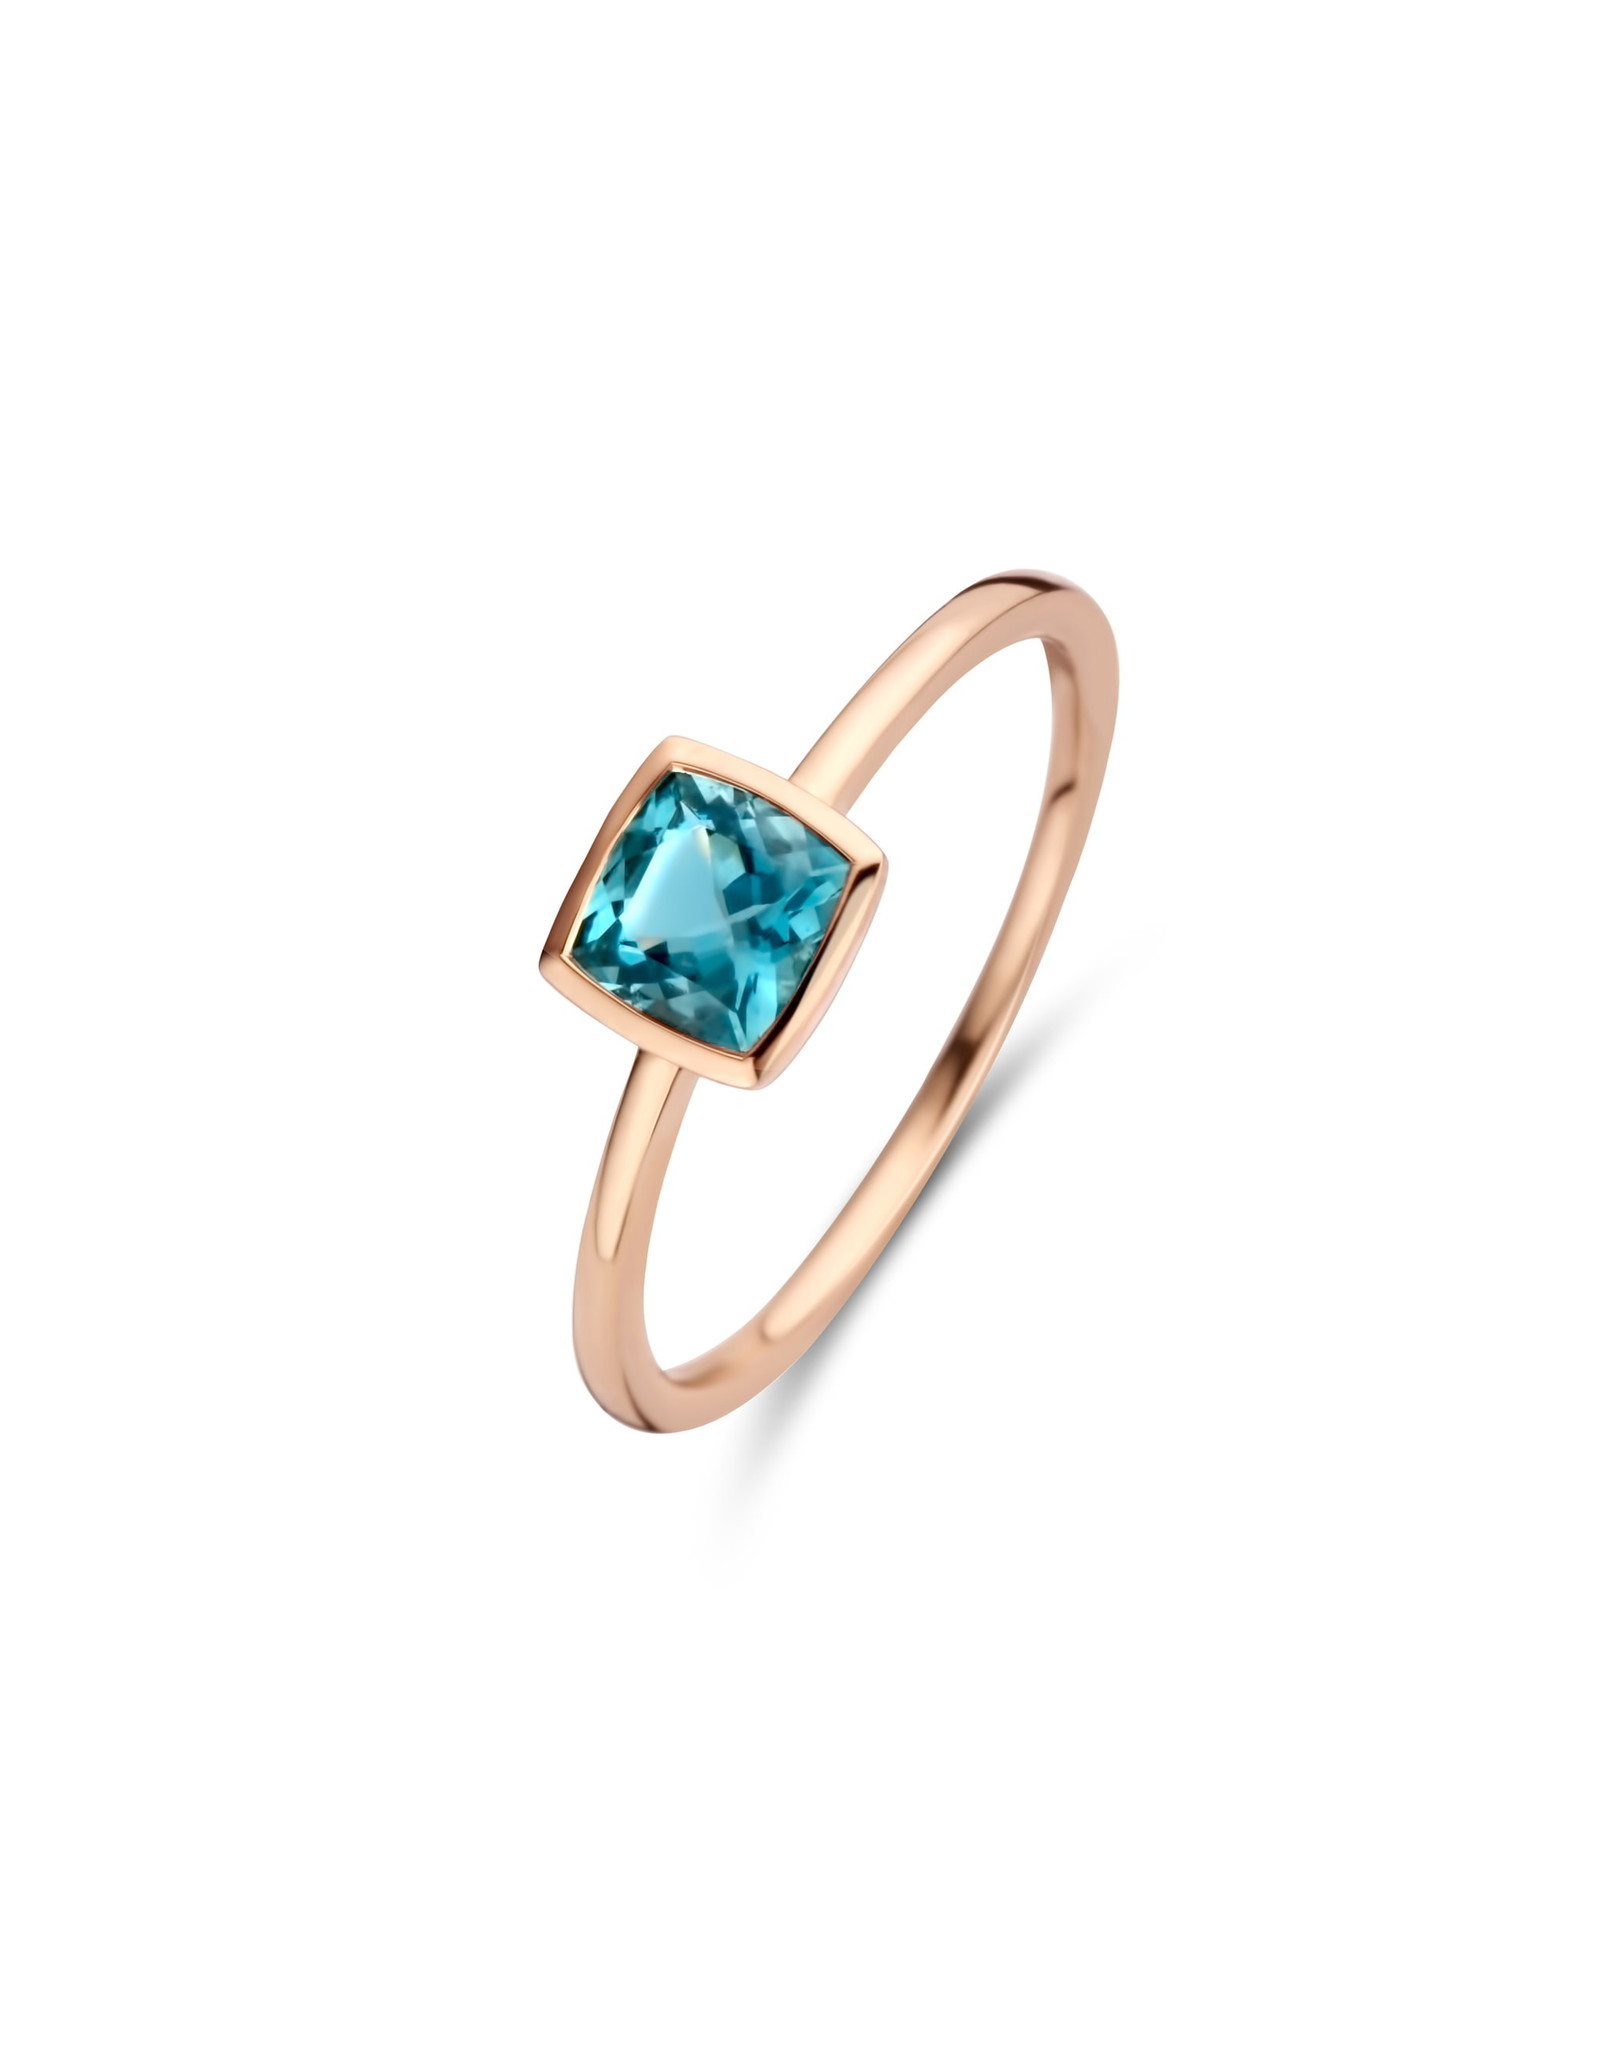 Ring Roos Goud 18kt 063016/T1-53 London Blue